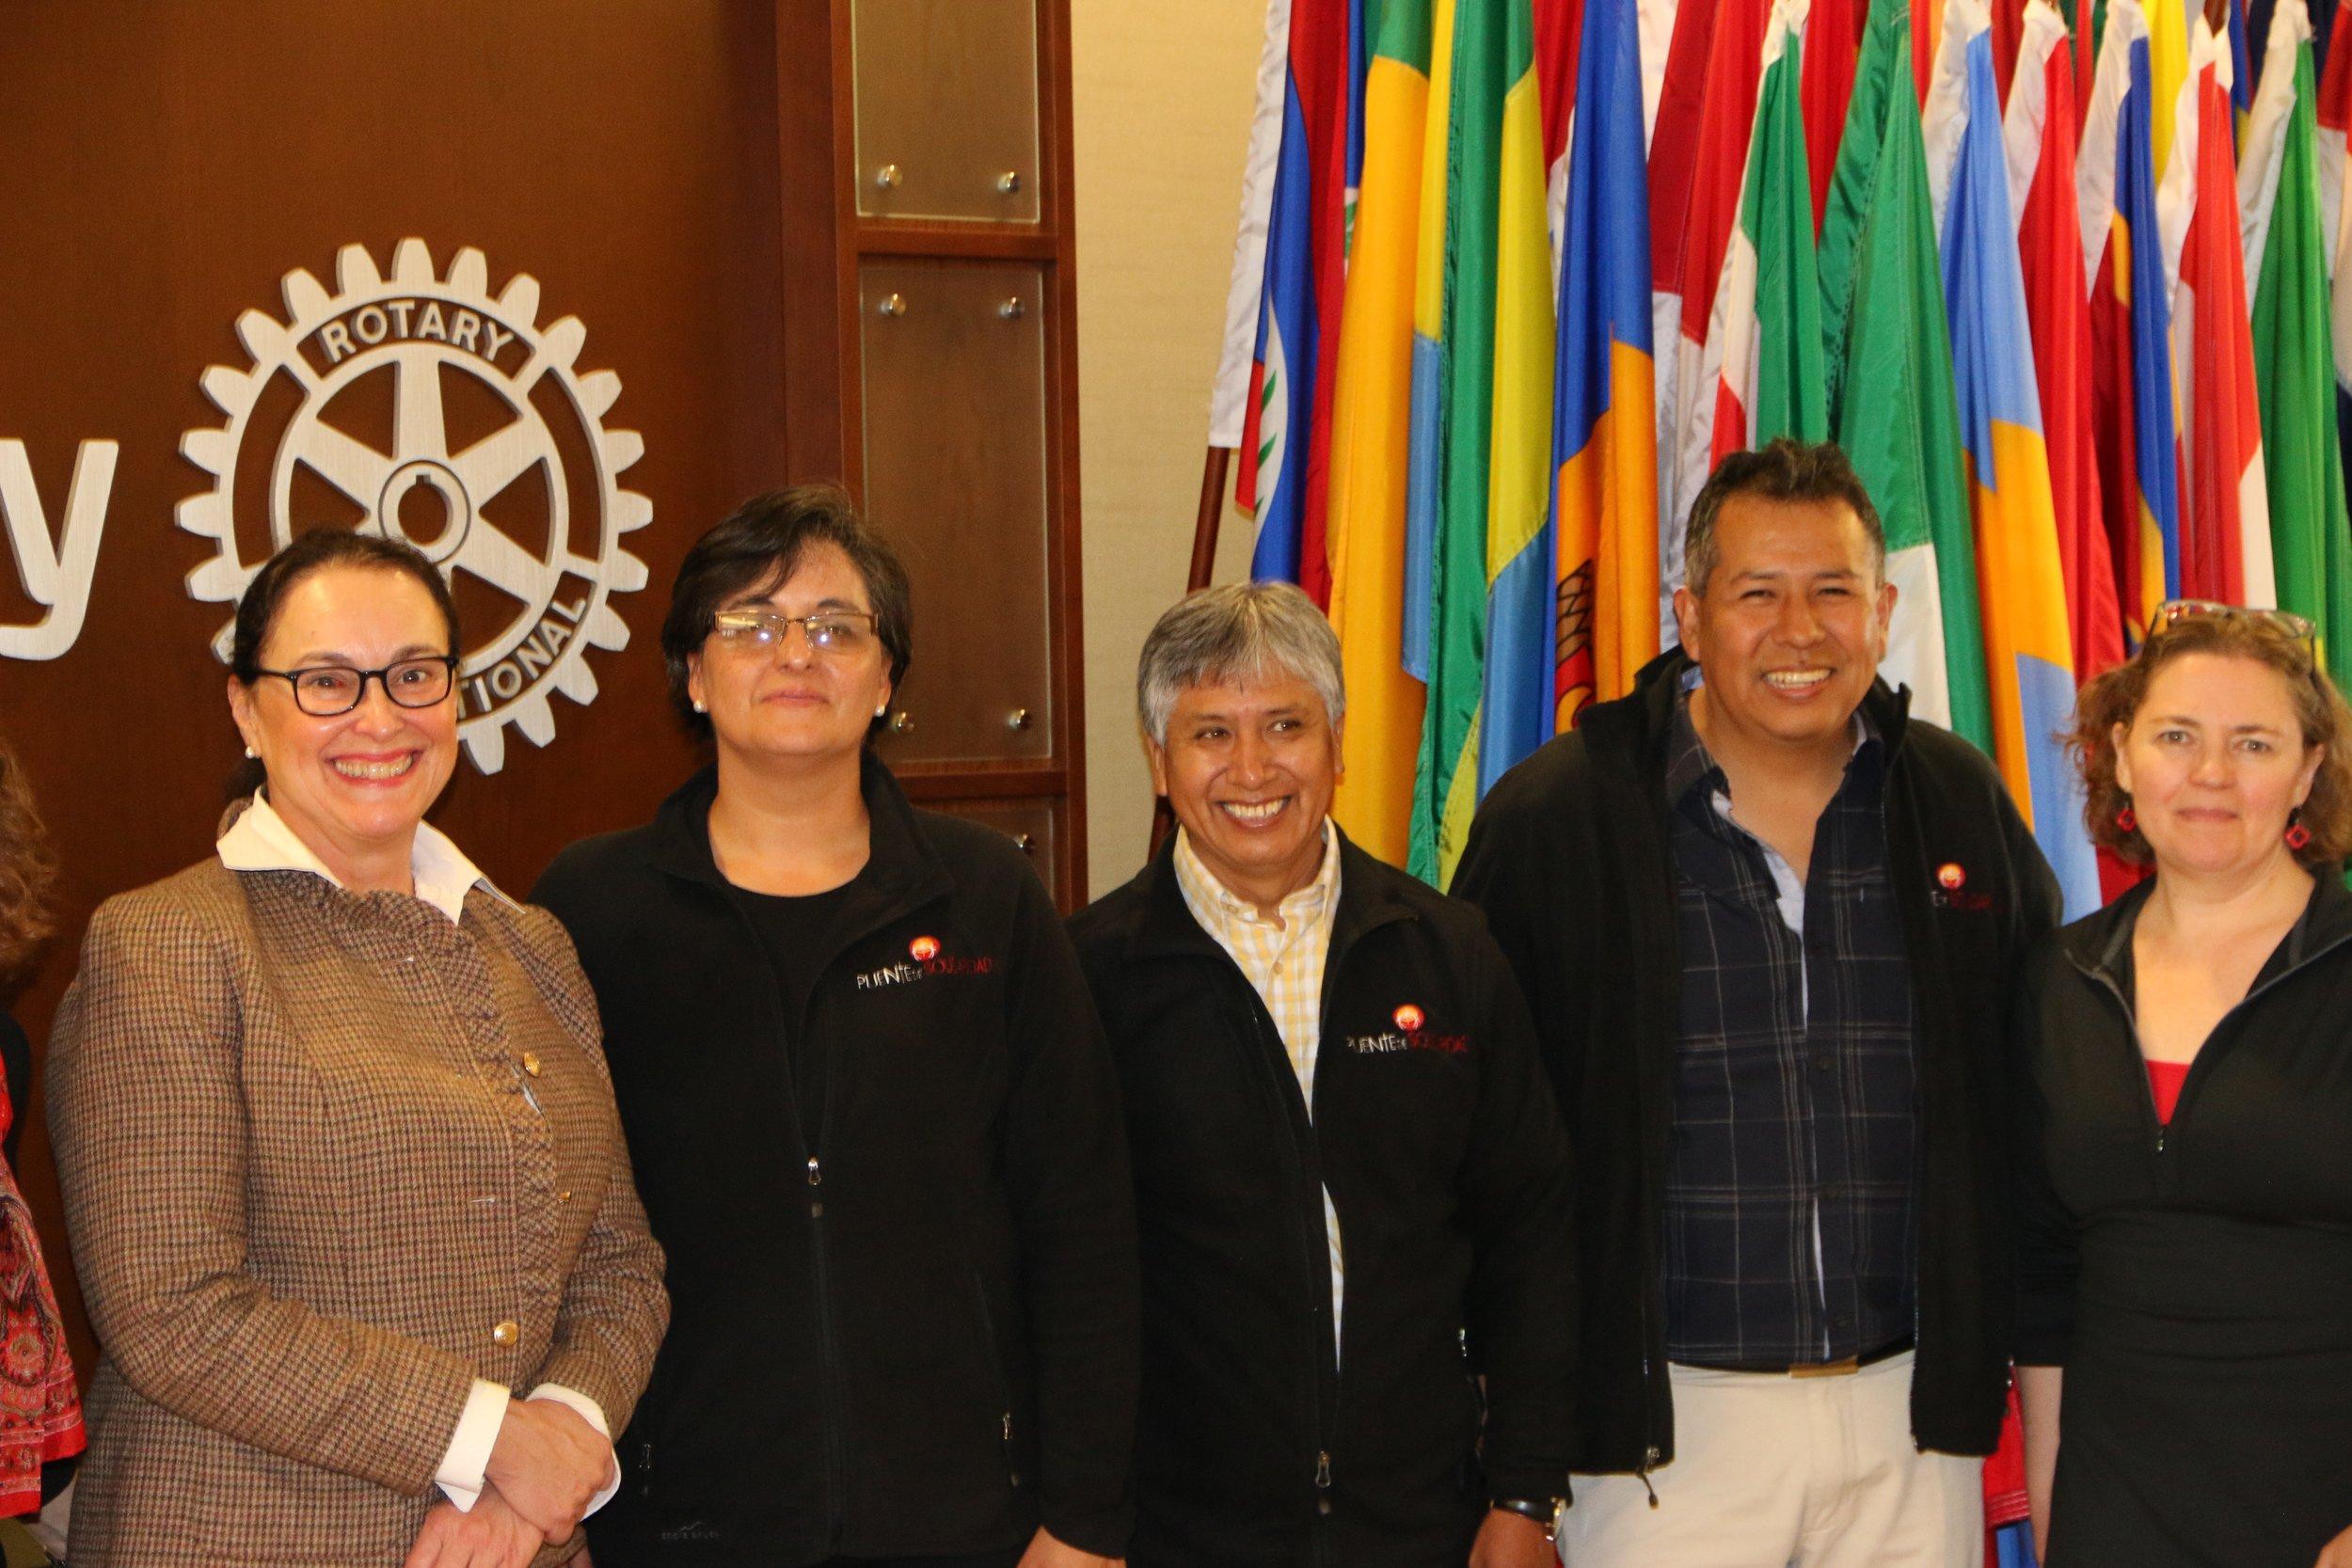 From left: Margarita Hewko (Rotary/One), Patricia Vargas (Puente de Solidaridad), Drs. Jaime Vallejos and Johnny Camacho (Viedma Hospital), and Jodi Grahl (Solidarity Bridge) in Evanston, April 2018.